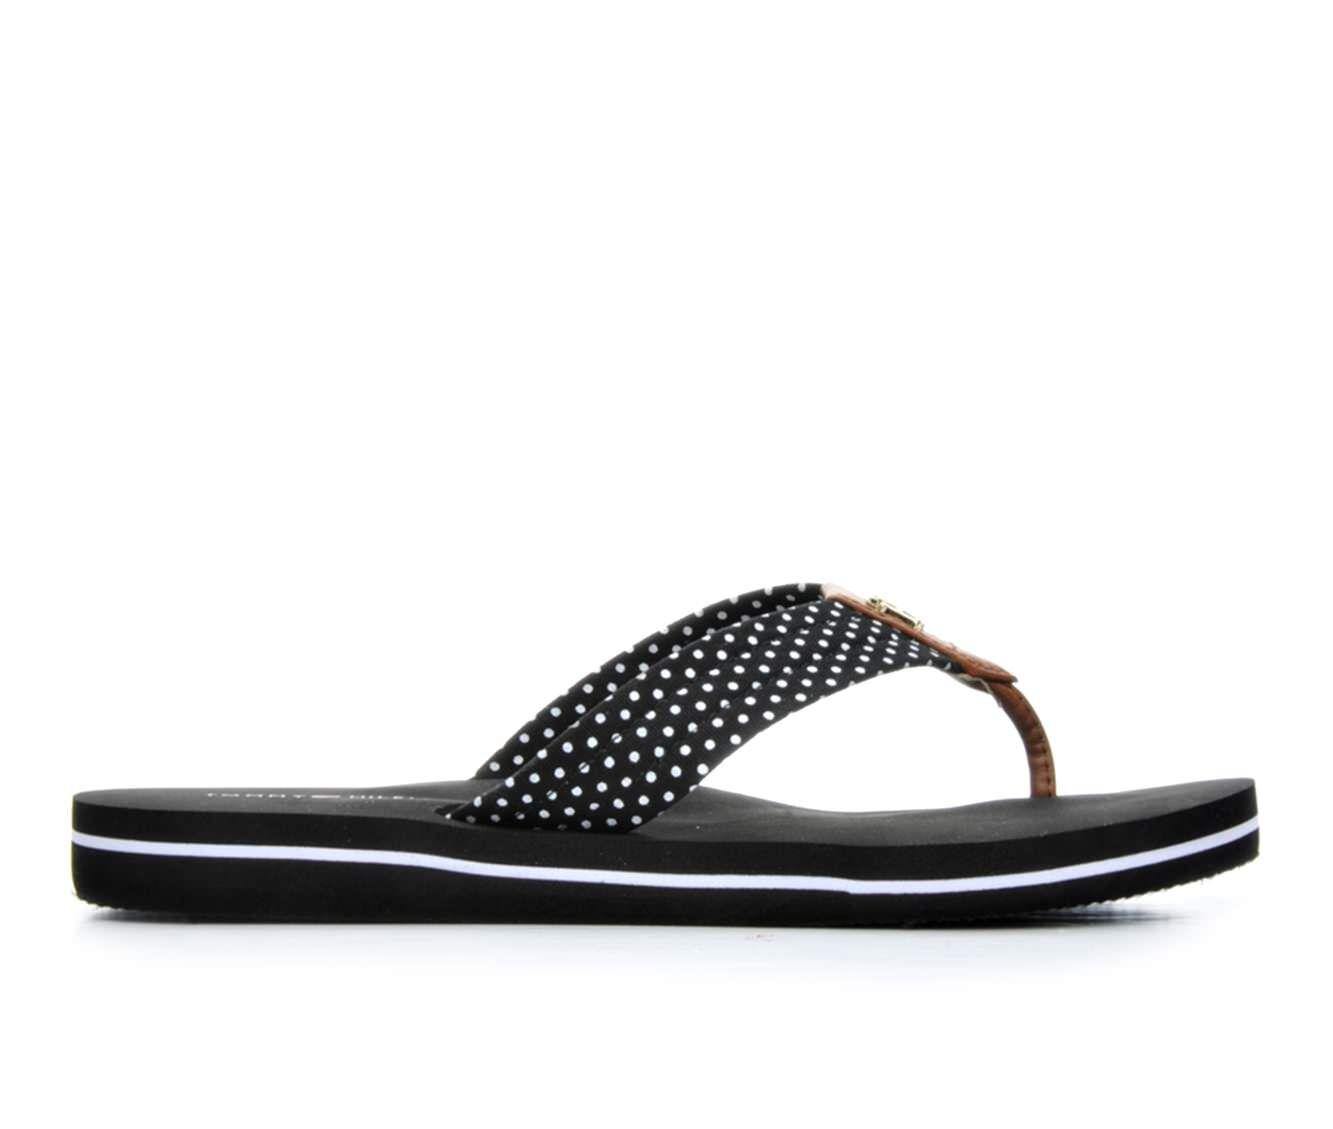 Women's Tommy Hilfiger Candis Flip-Flops Black/White